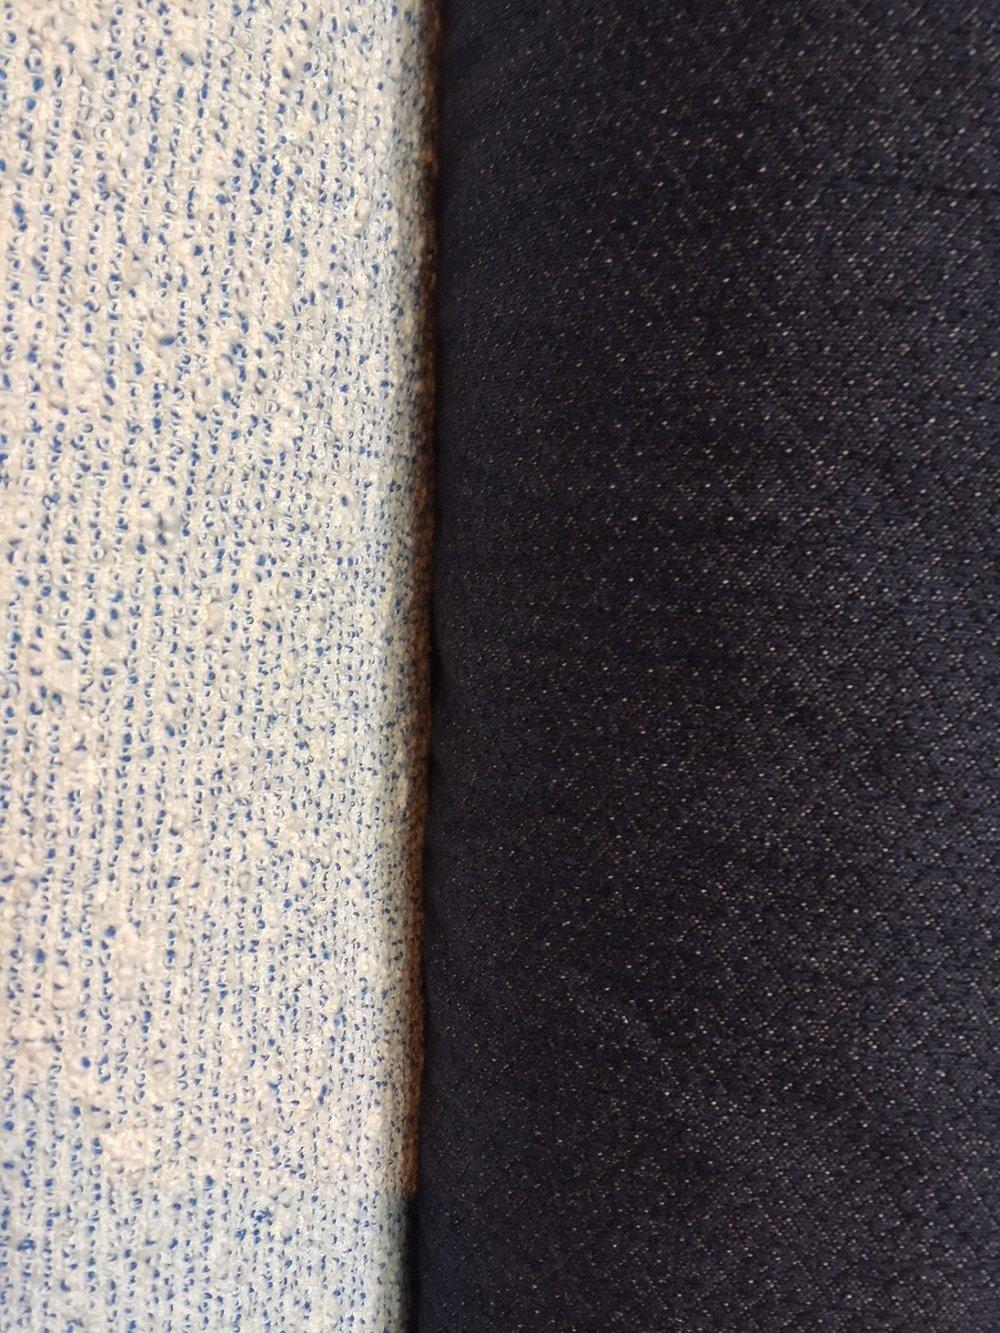 texture close up.JPG